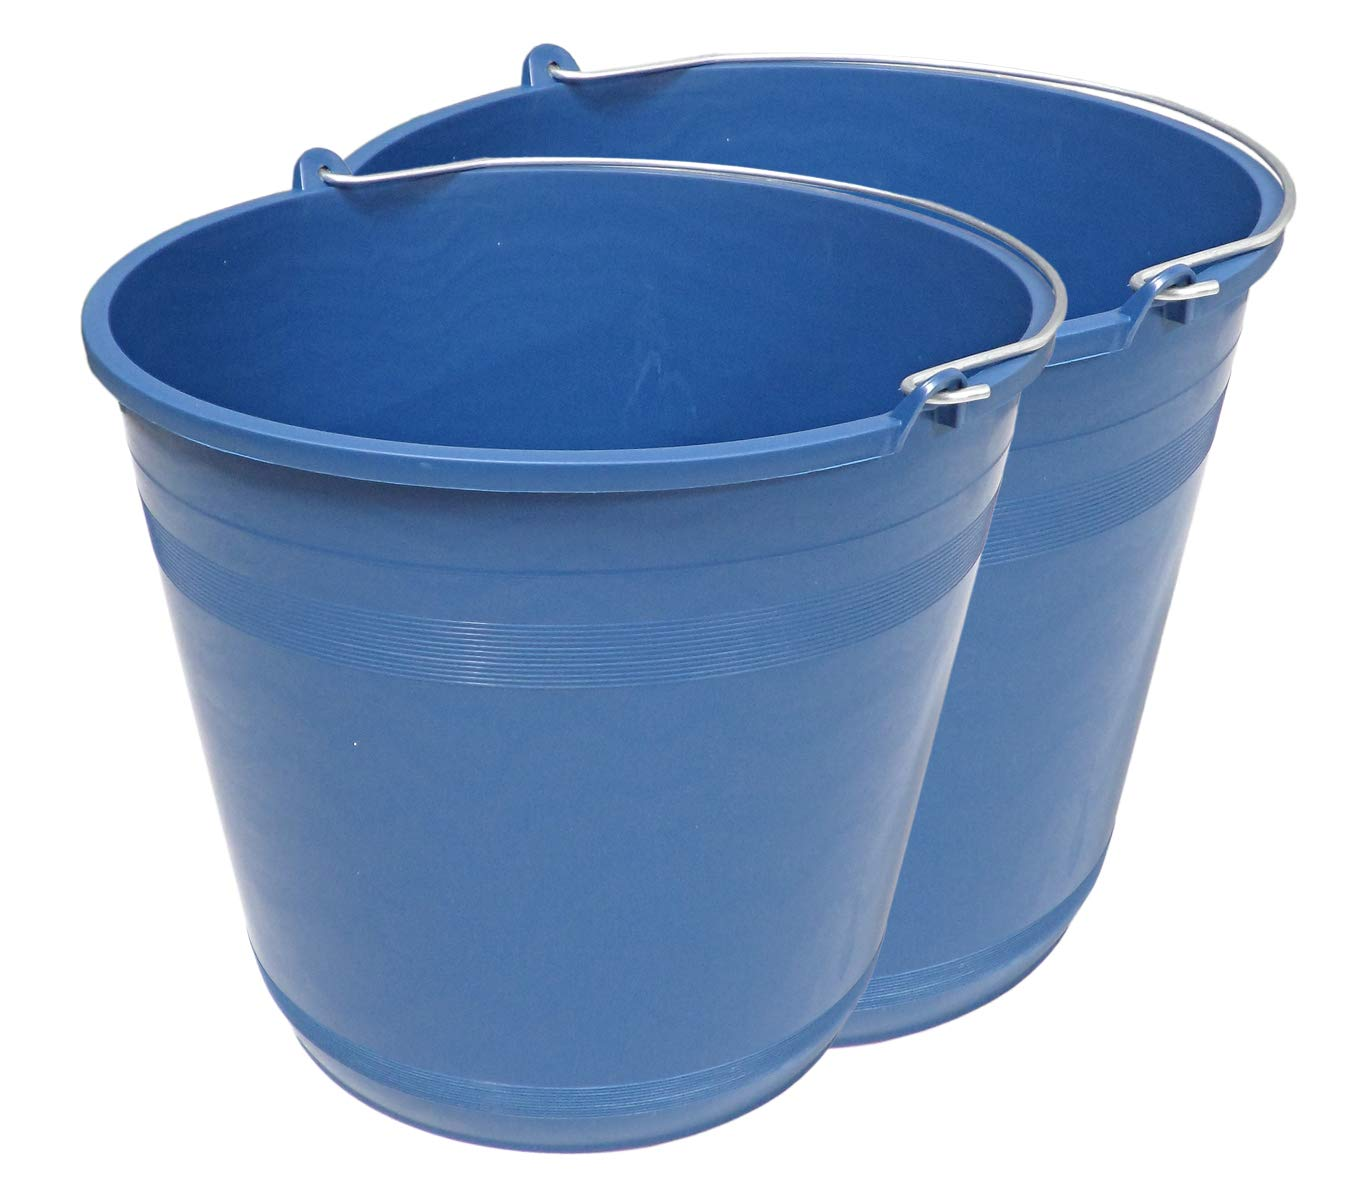 Pack de 2 Cubos Agua Plá stico Reciclado 6 Litros (Azul) PROMOPASTOR. S.L.